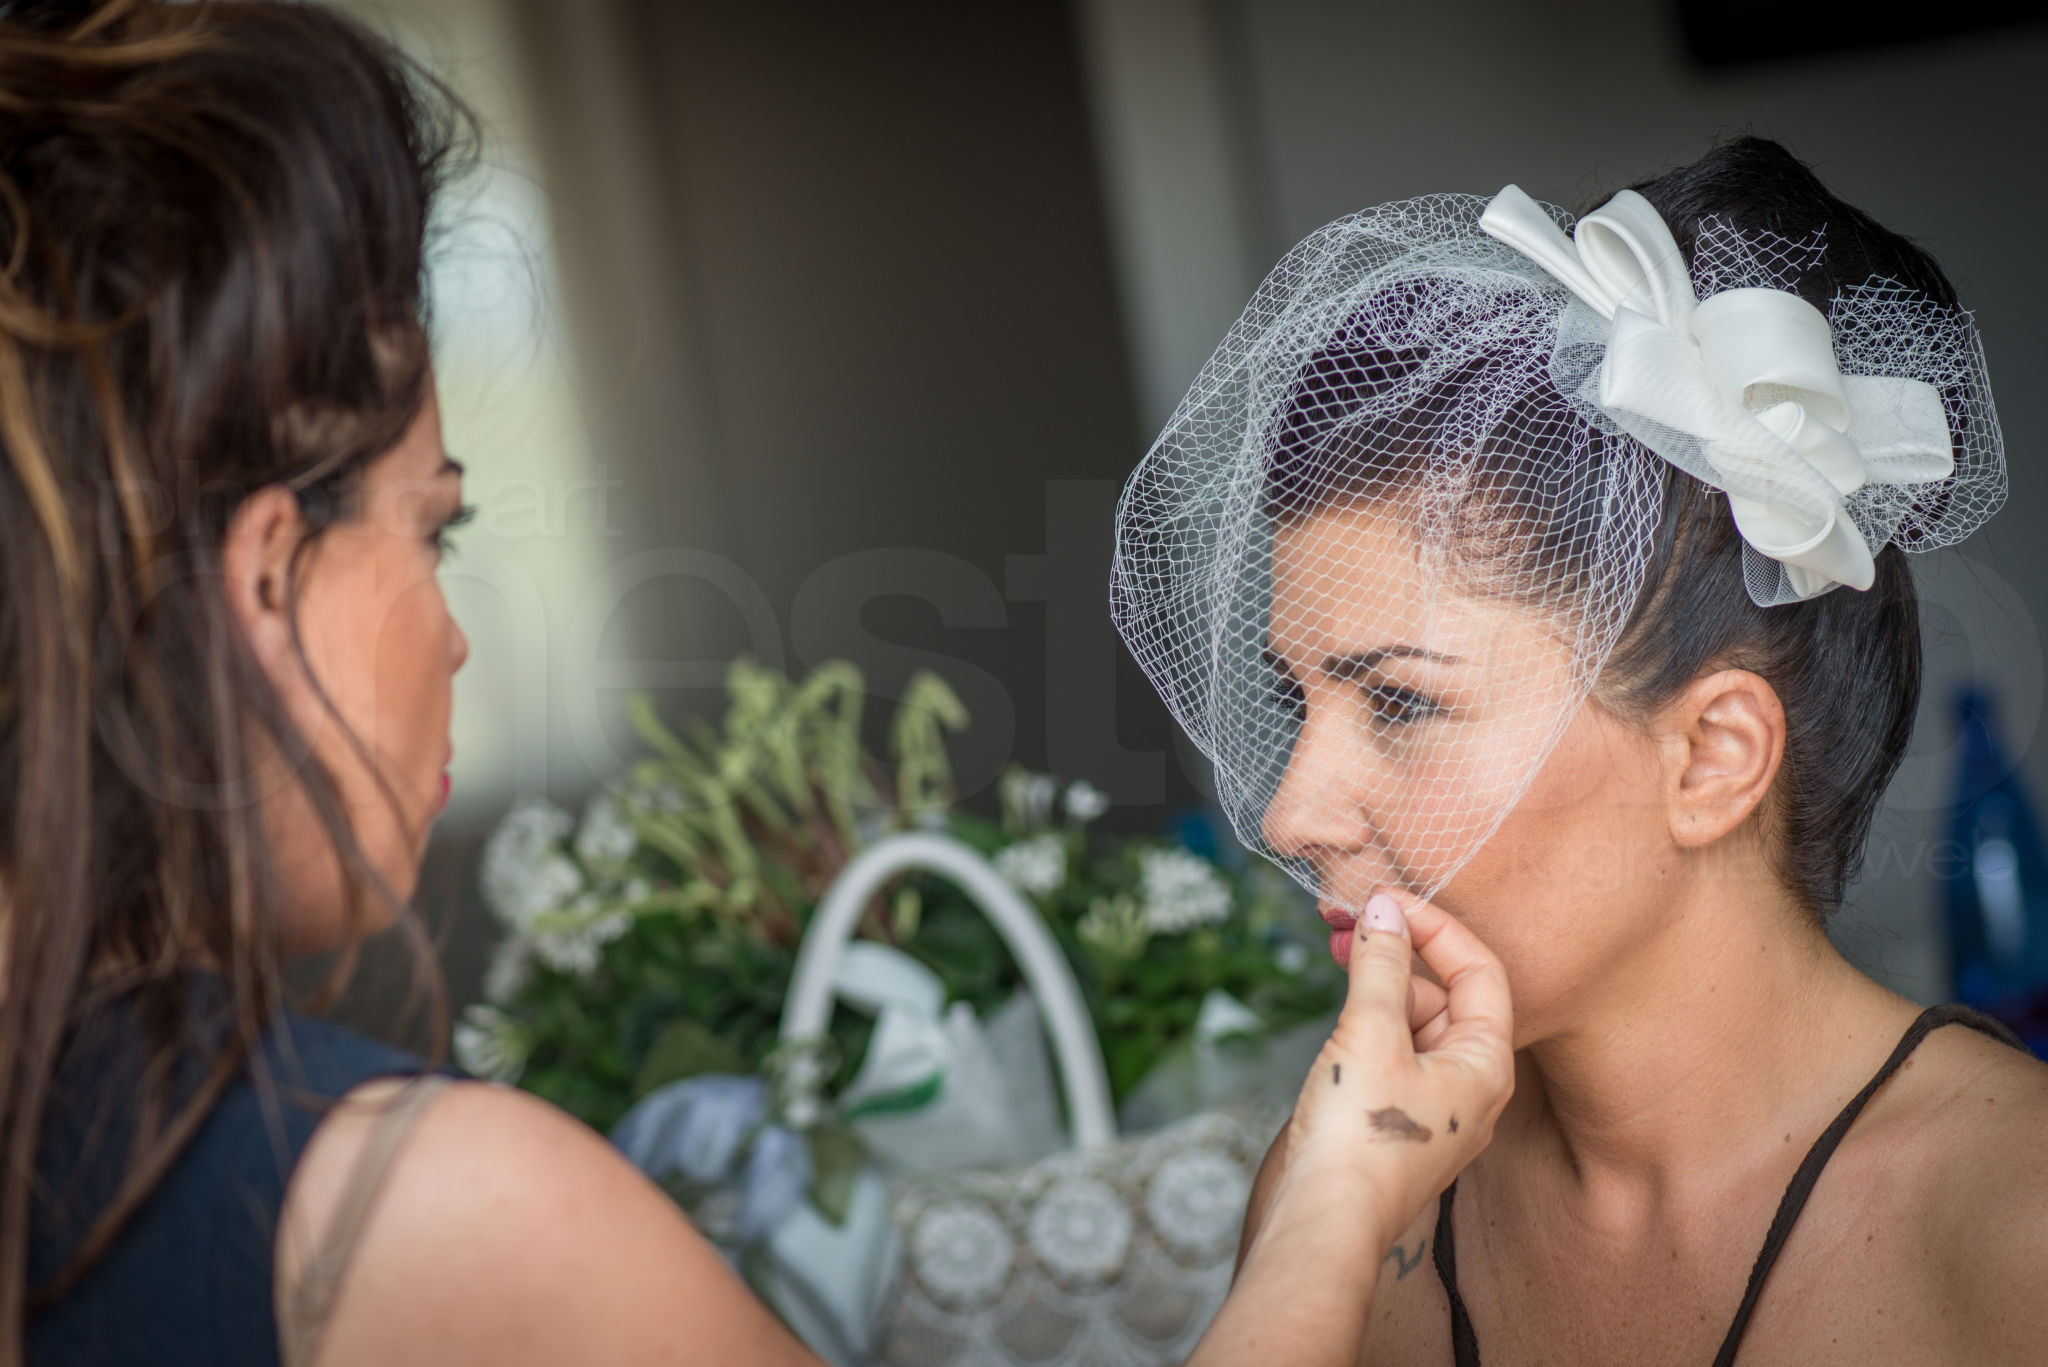 https://lnx.mirkone.it/wp-content/uploads/2015/07/fotografo-matrimoni-faenza-0002.jpg